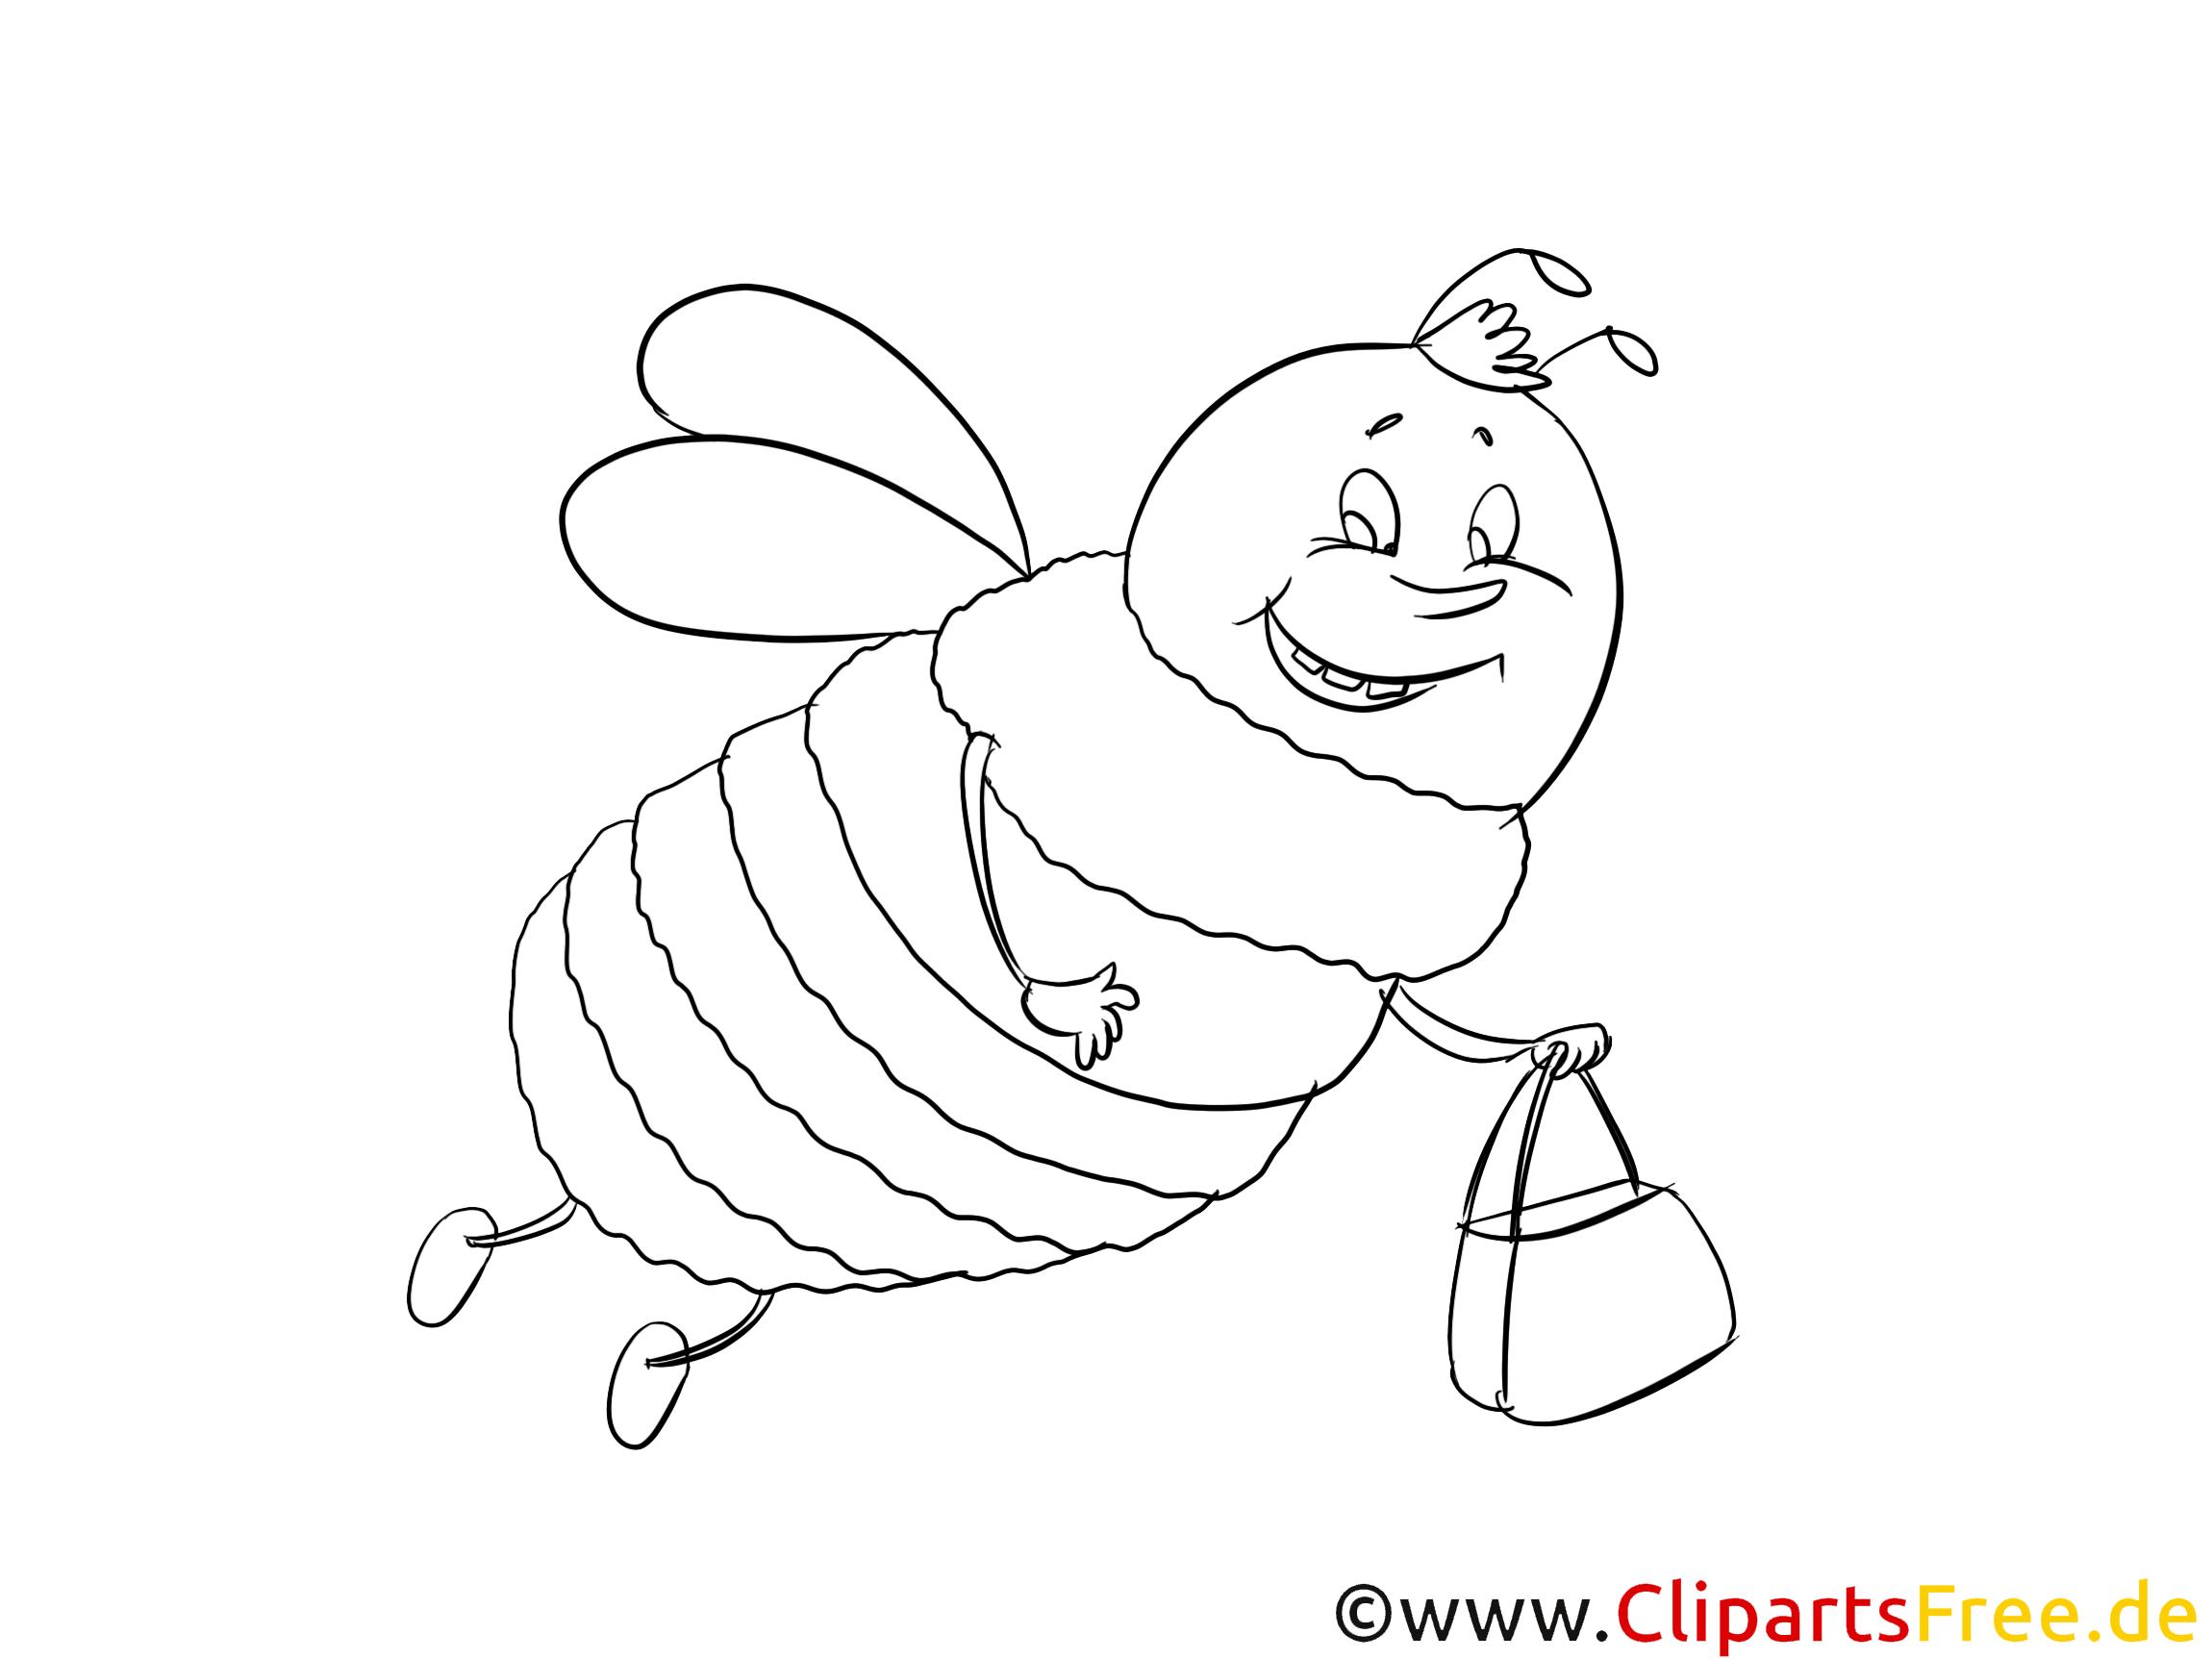 Grosse Biene Malvorlage